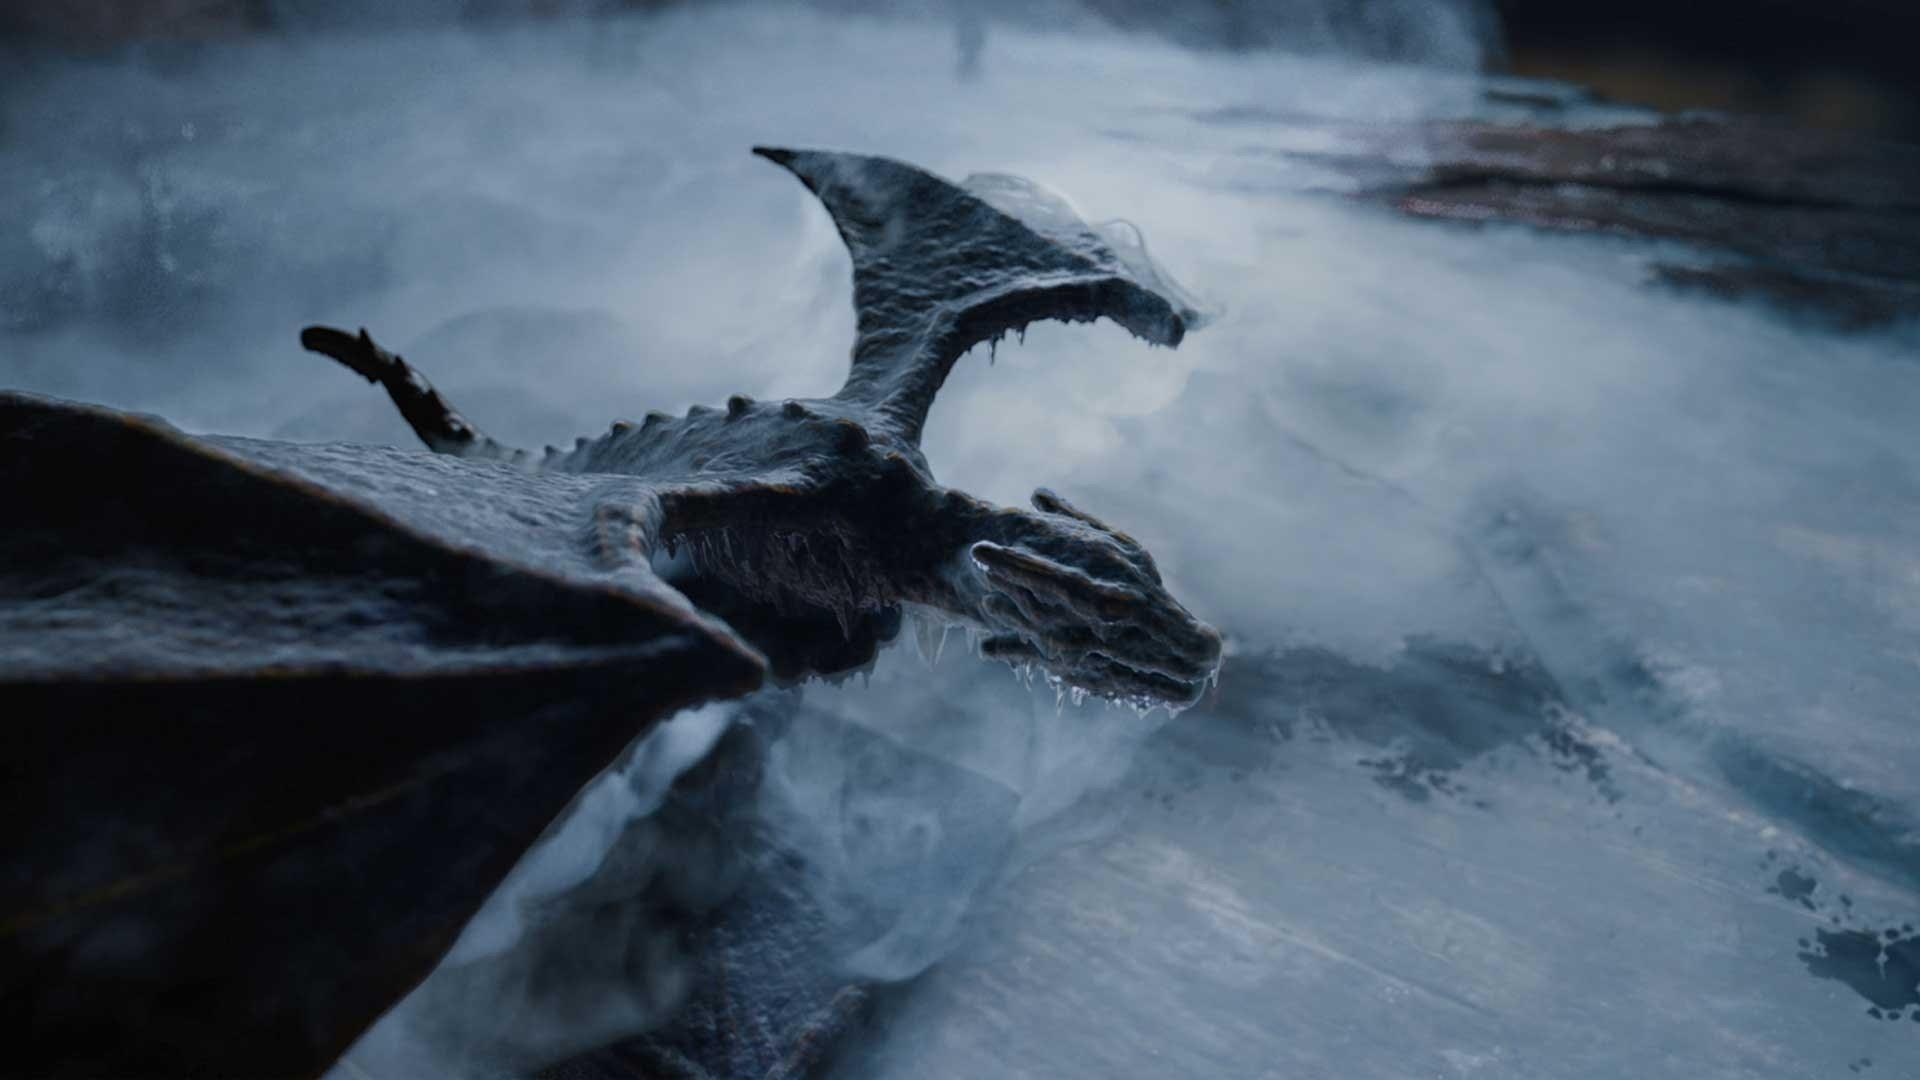 Movie Wallpaper Game Of Thrones Season 8 Dragon Poster